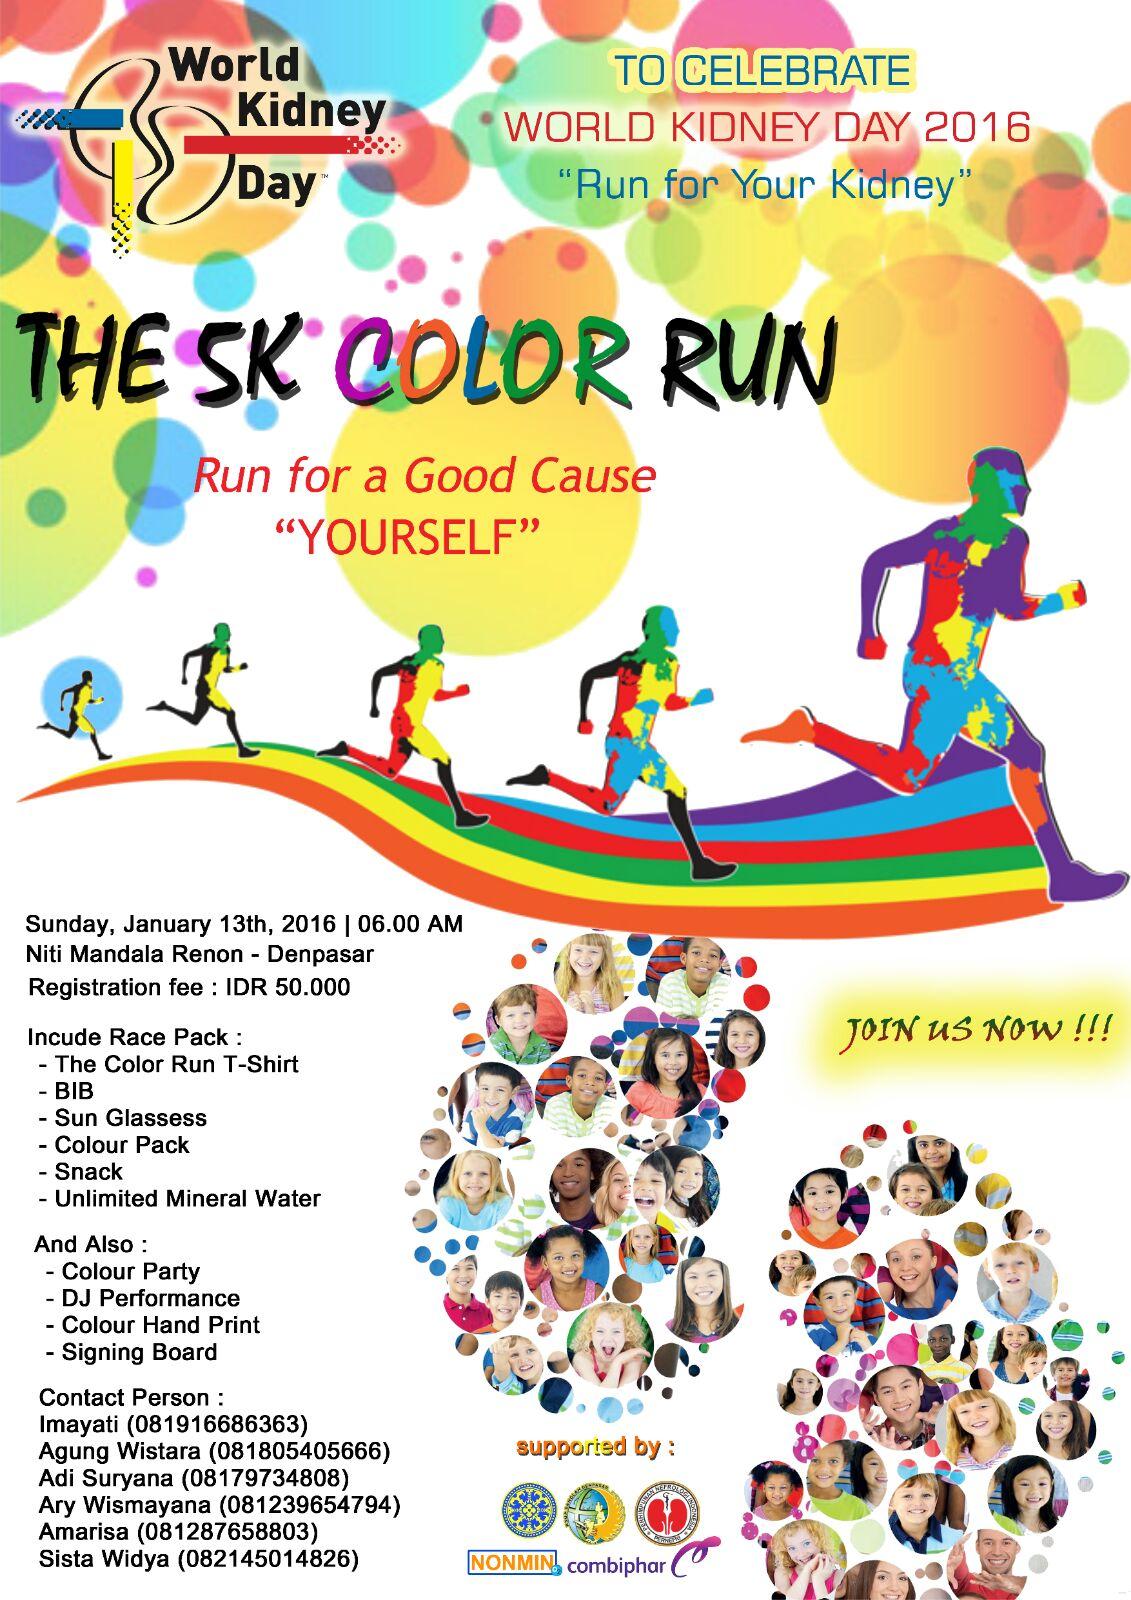 The 5k Color Fun Run World Kidney Day